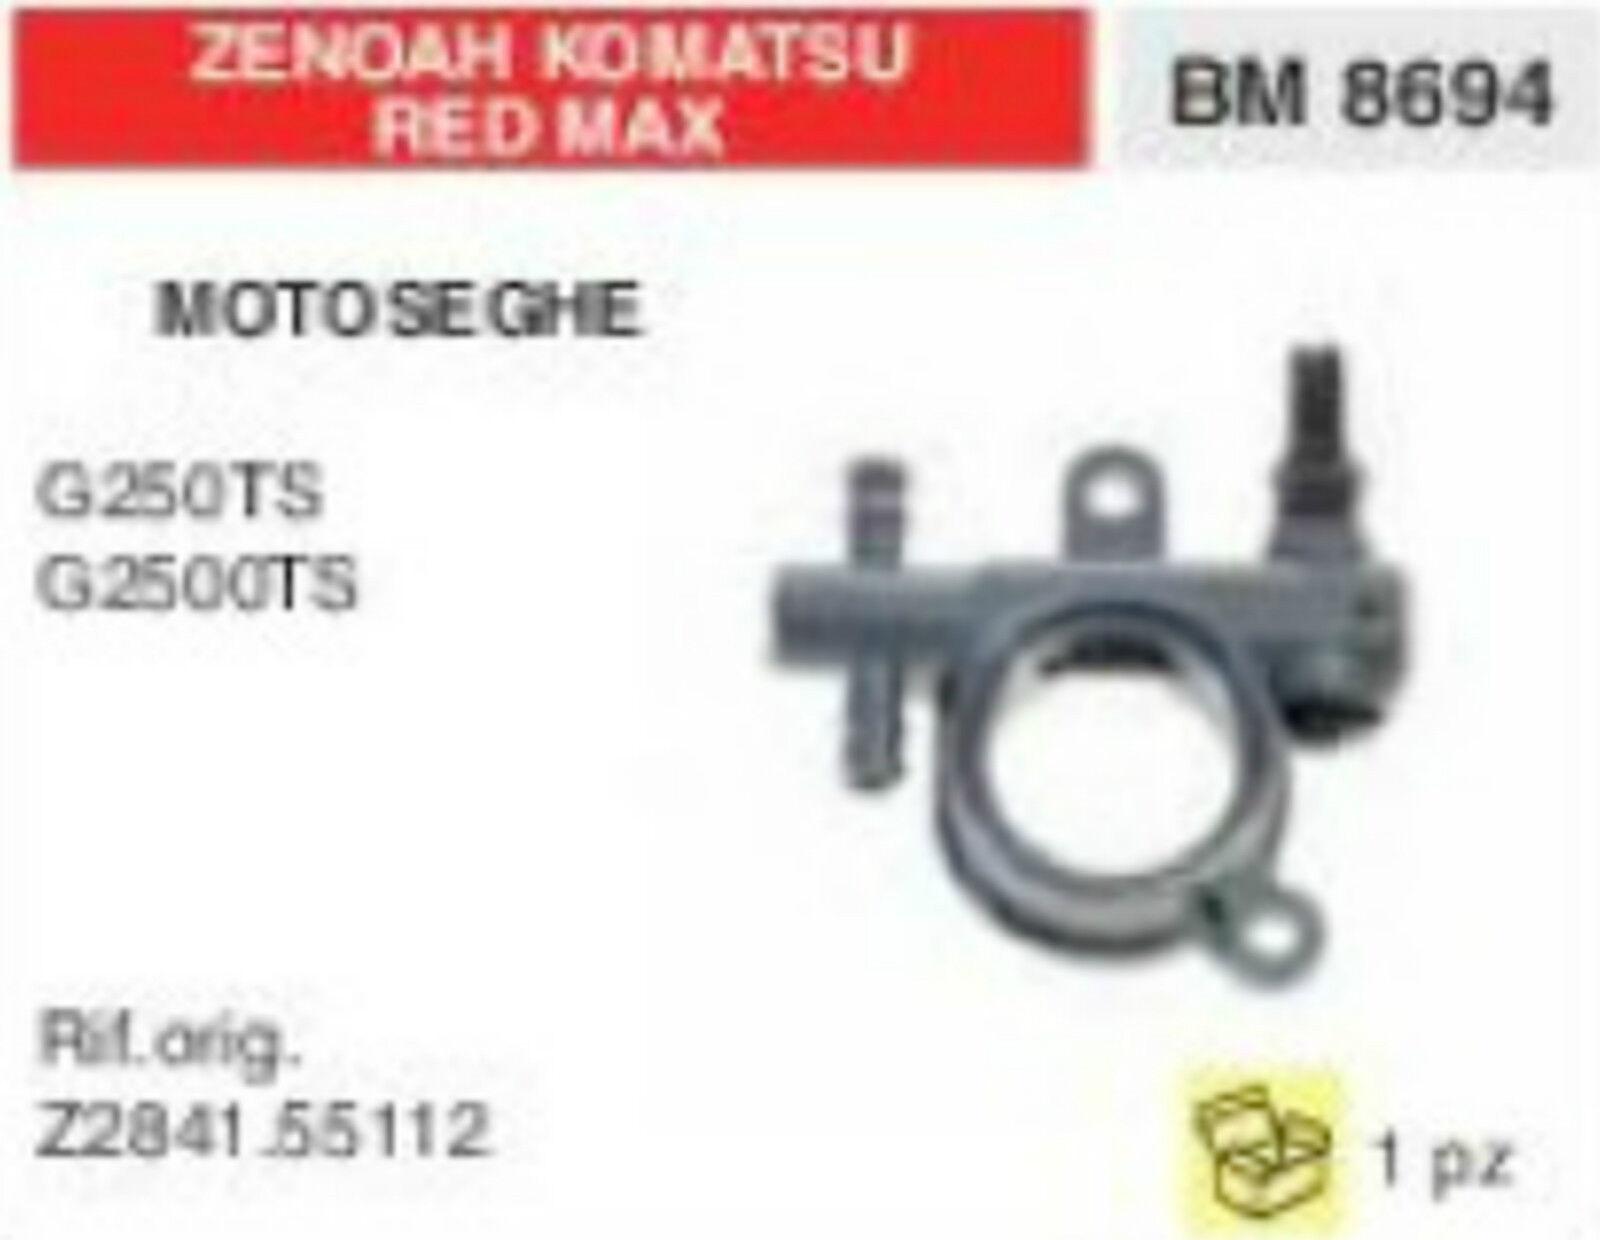 Z263055103 POMPA OLIO COMPLETA MOTOSEGA ZENOA KOMATSU rojo MAX G310 TS G3100TS